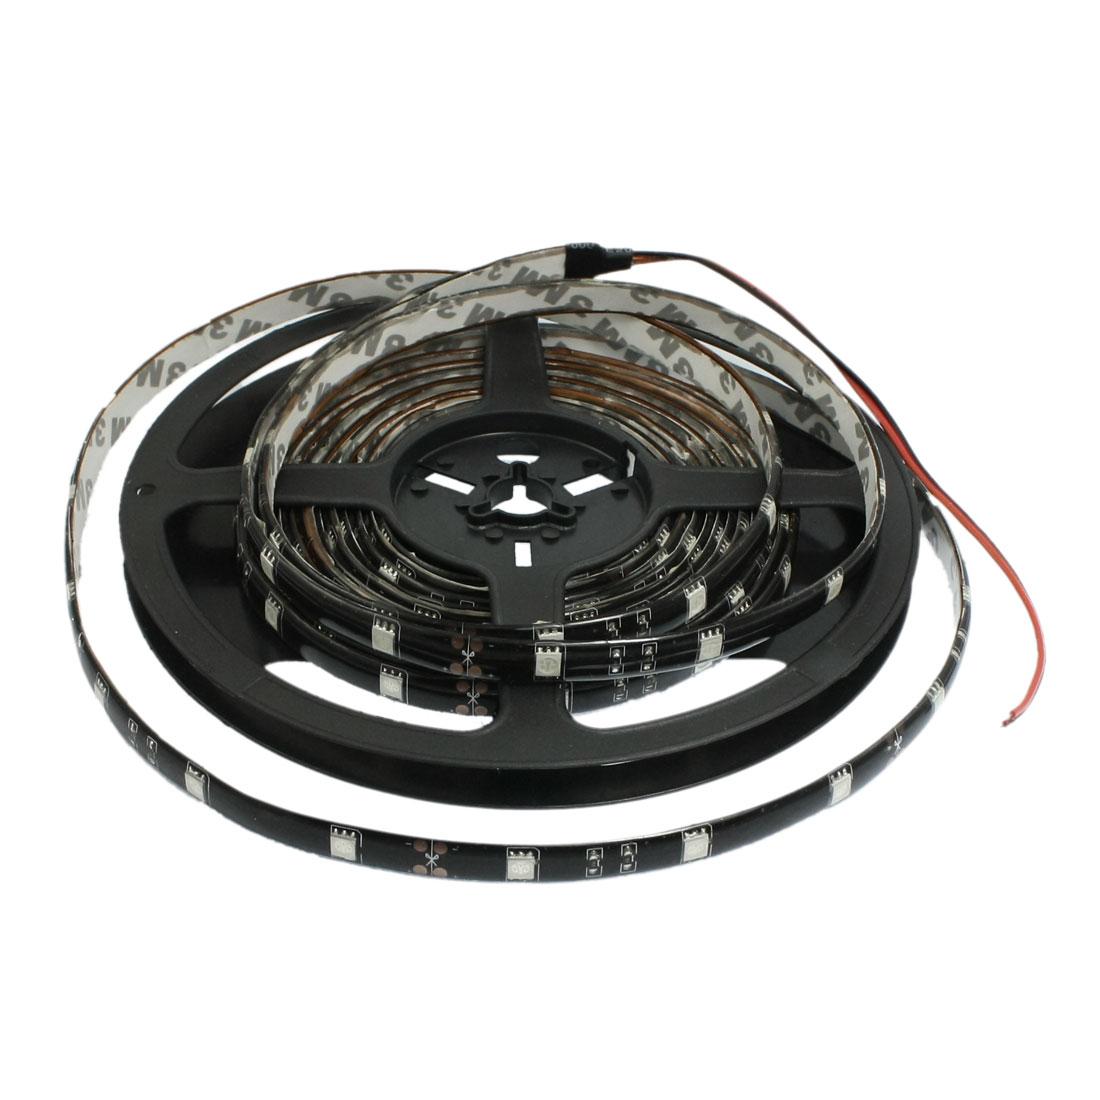 5M 5050 SMD 150 LEDs Flexible Strip Lights Blue Car DIY Christmas Decor